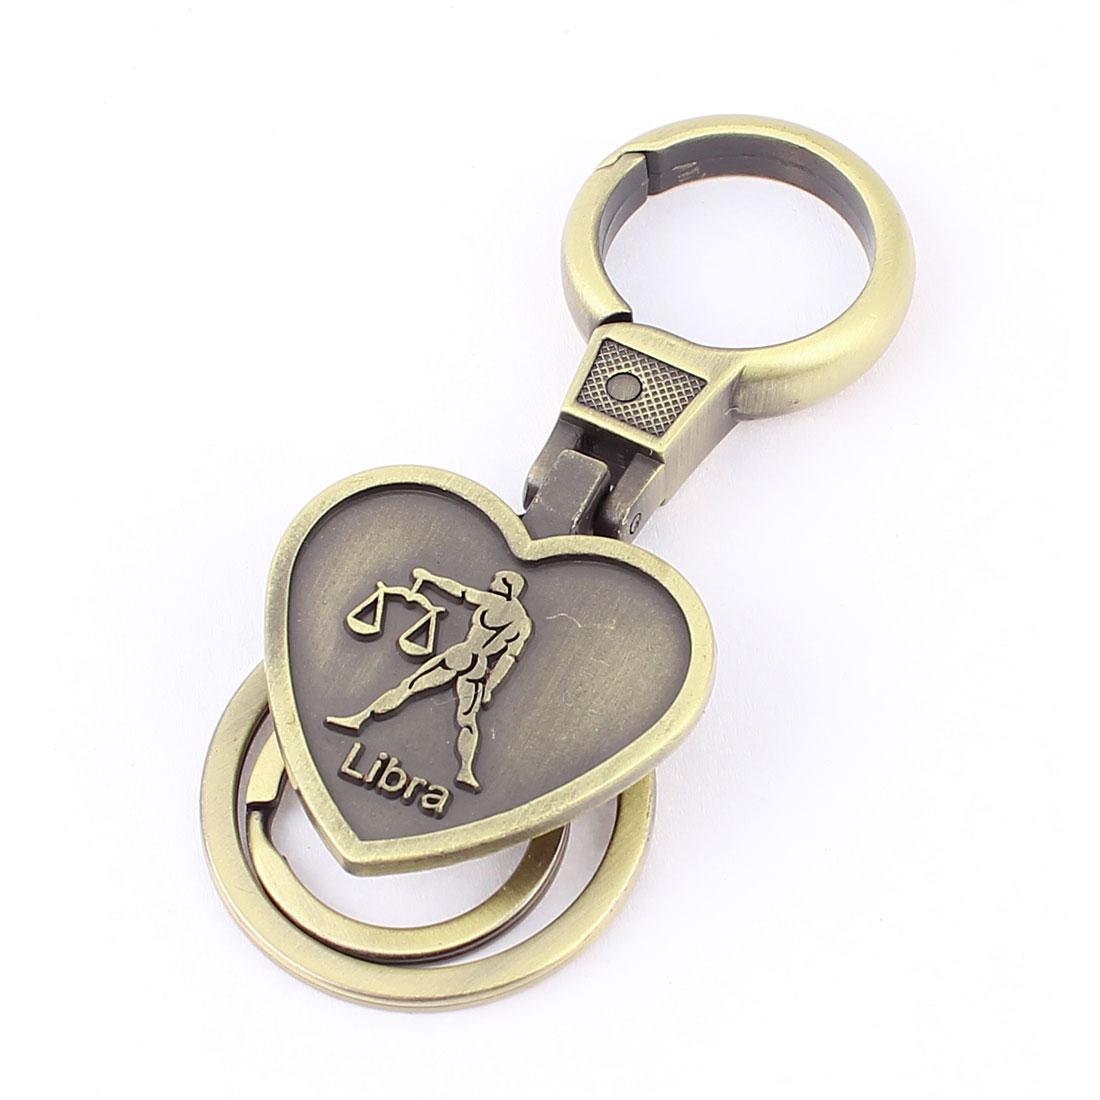 Libra Embossment Heart Shaped Pendant Keyring Keychain Bronze Tone